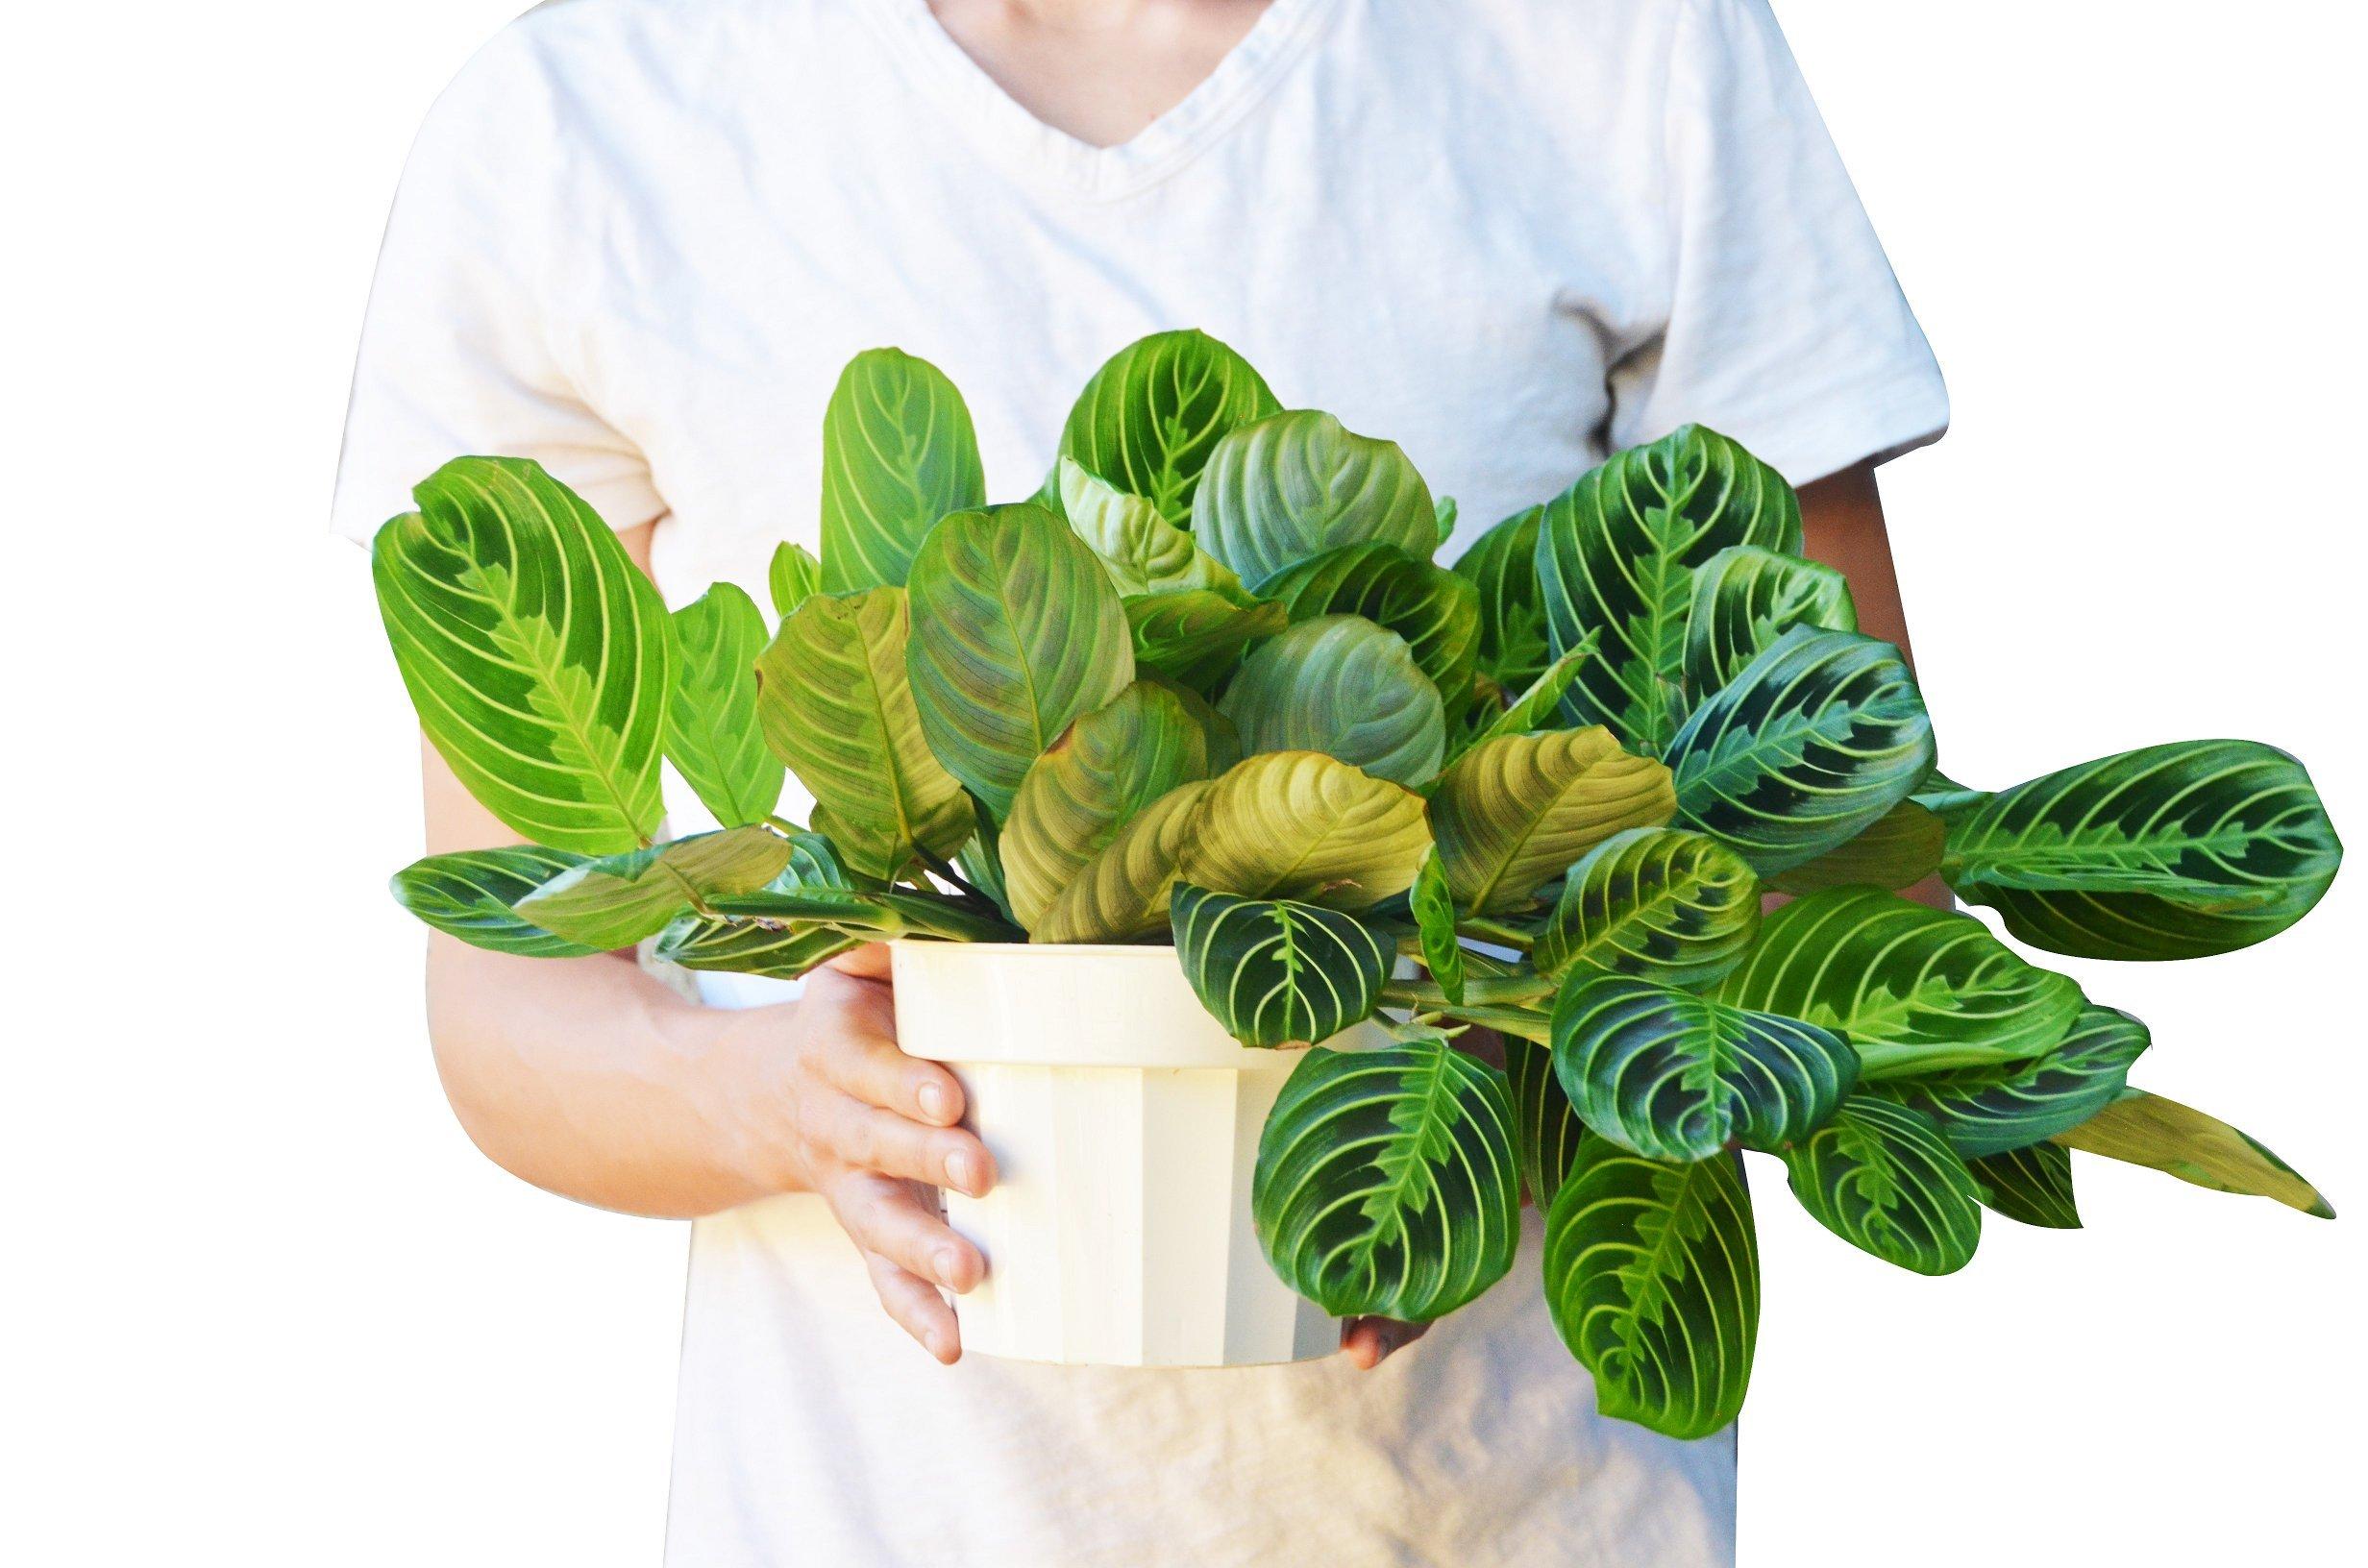 Maranta 'Lemon Lime' in 6'' Pot - Prayer Plant - Live House Plant - FREE Care Guide